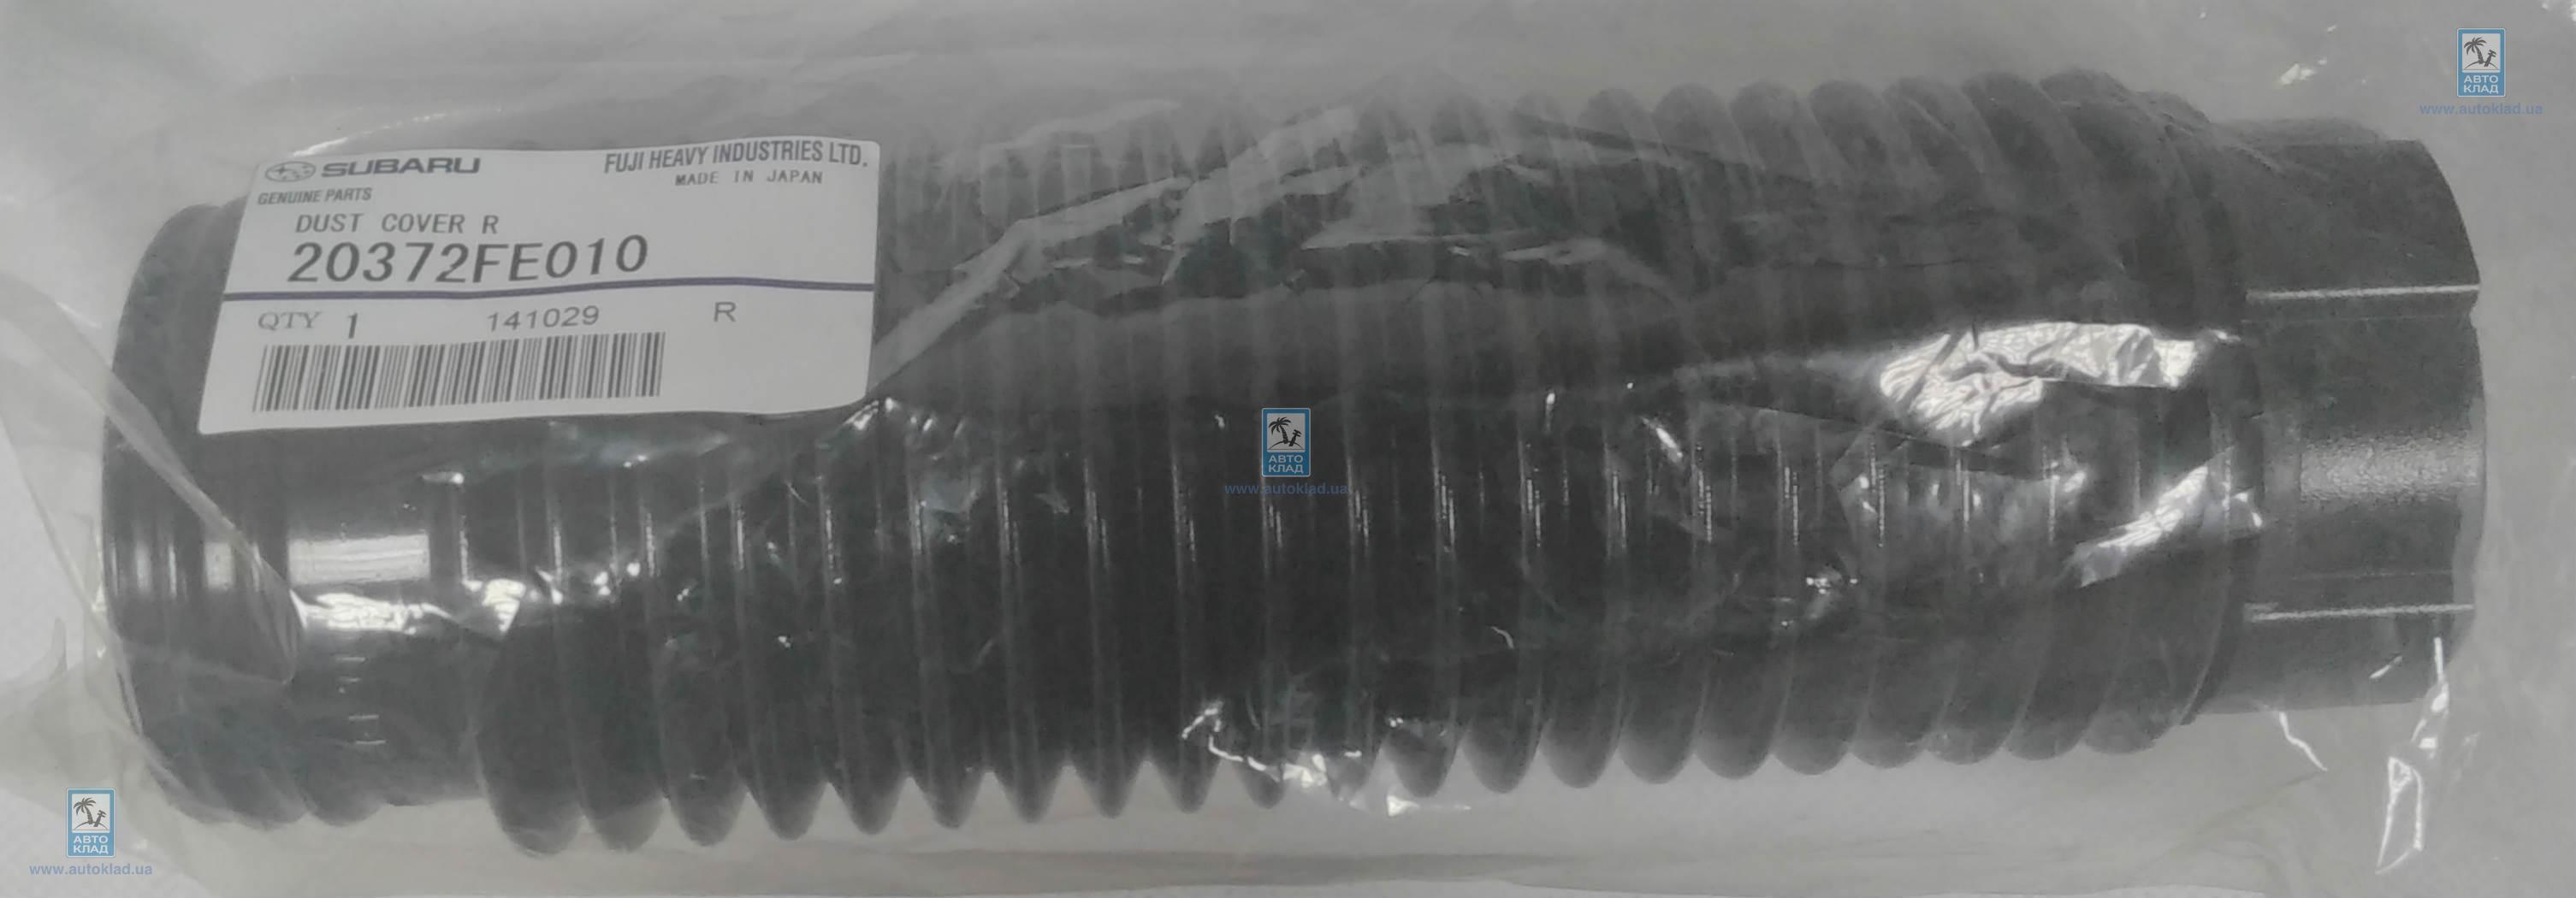 Пыльник амортизатора SUBARU 20372FE010